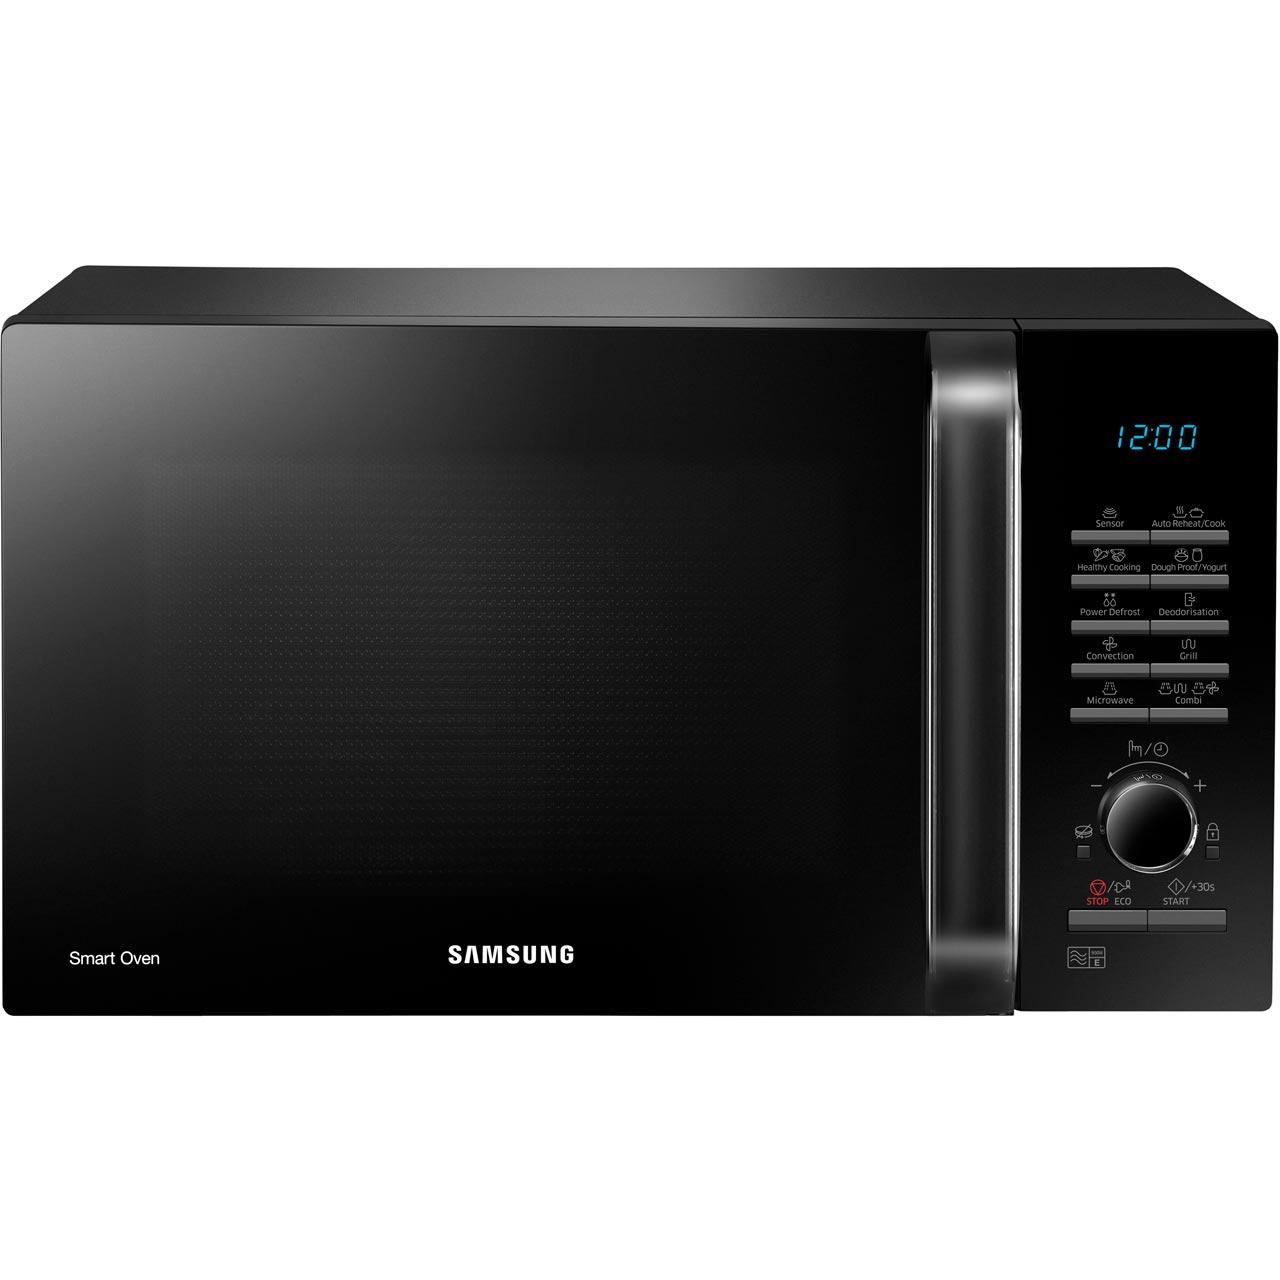 Samsung Smart Oven Microwave: Samsung MC28H5125AK Smart Oven 900 Watt Microwave Free